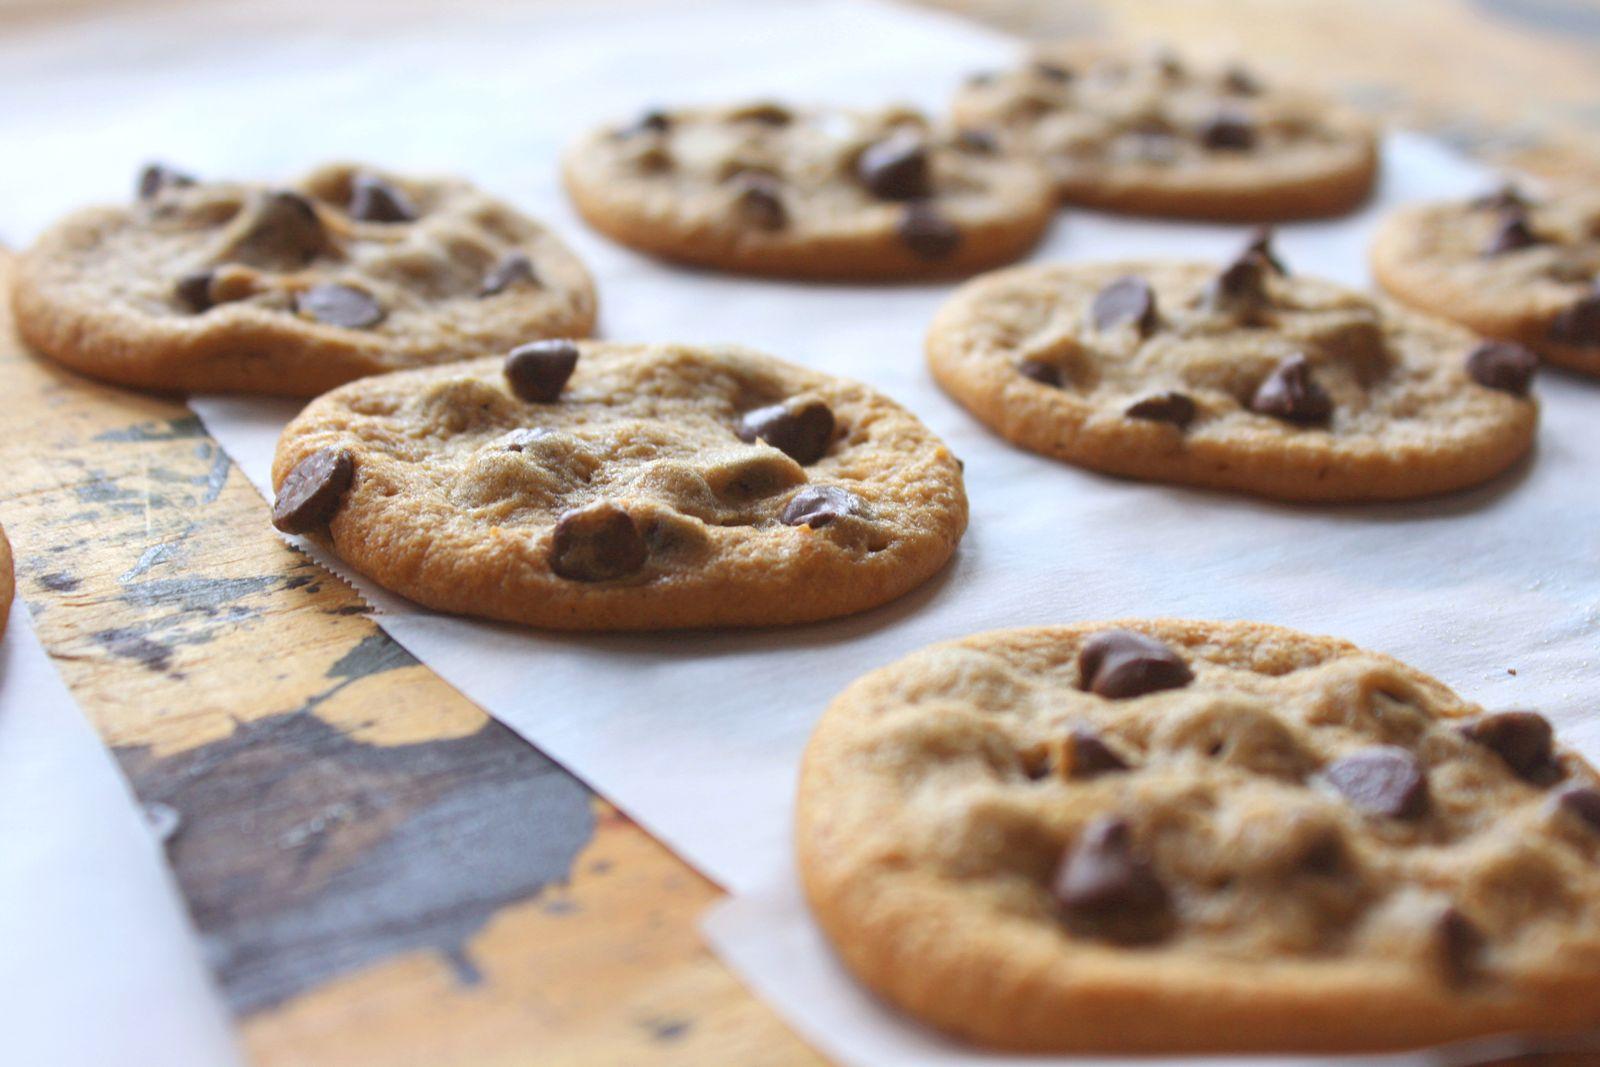 Celebrate National Chocolate Chip Day The Nestlé Toll House Café by Chip Way